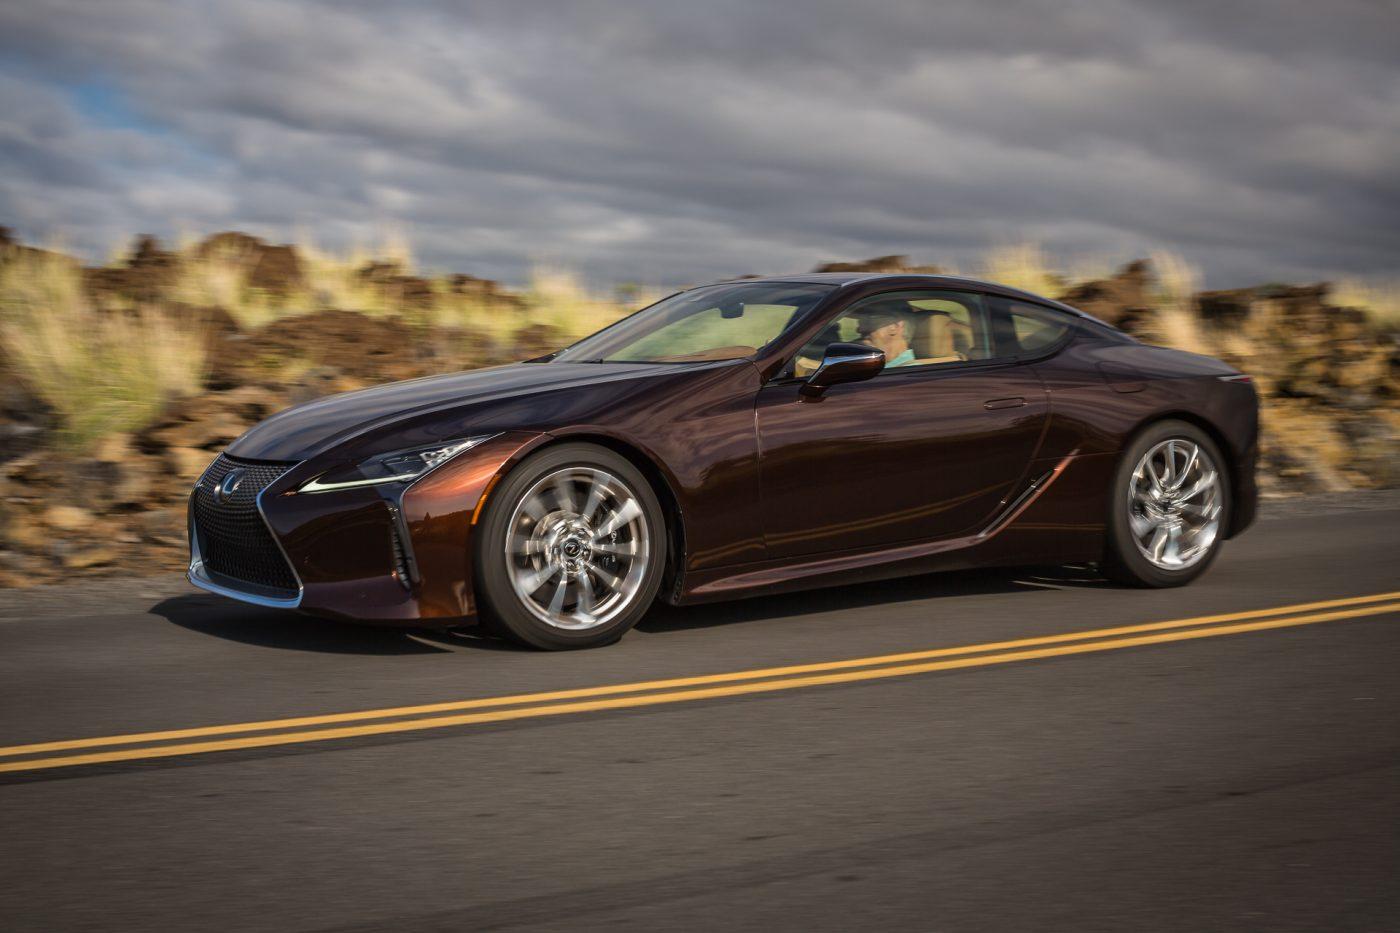 Road Test: 2018 Lexus LC 500 ·  Lexus_Man_Machine_2_DAF973EA3B16644DD53D3391CE7D884C3B54B19D